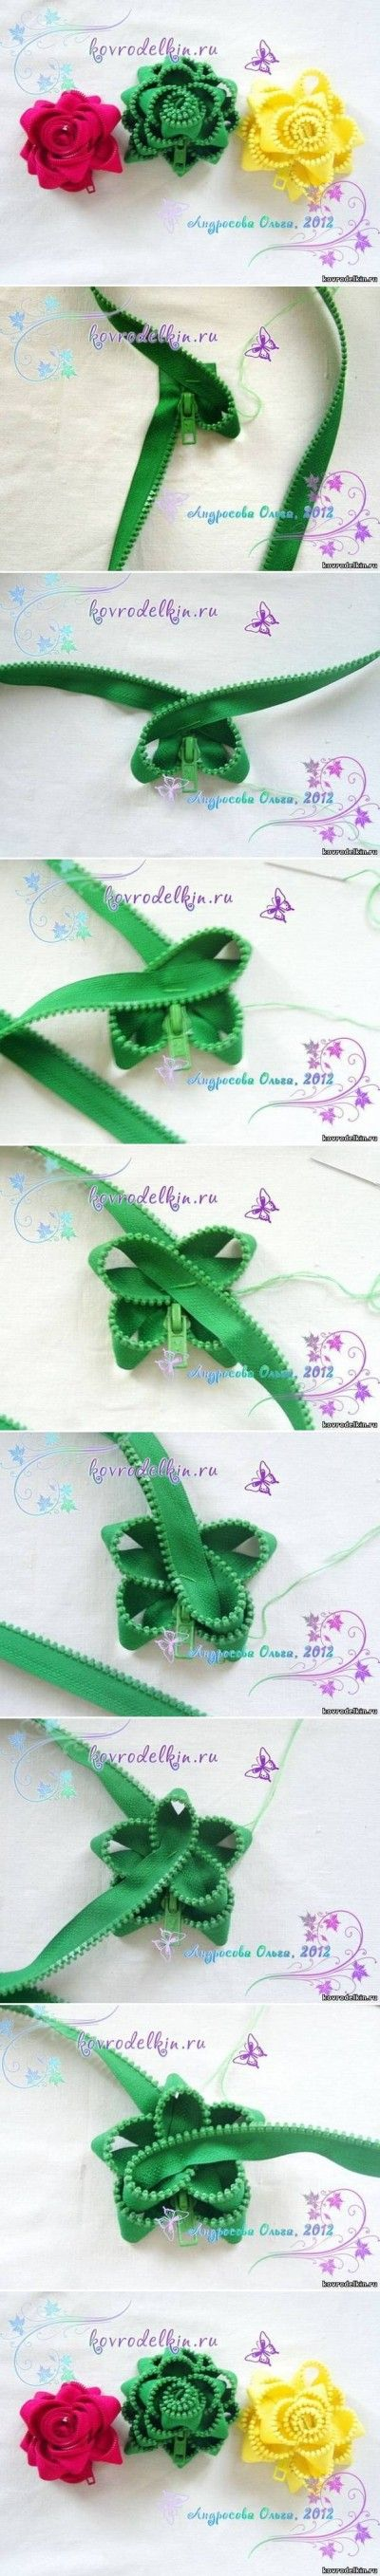 DIY Easy Zipper Rose | www.FabArtDIY.com LIKE Us on Facebook ==> https://www.facebook.com/FabArtDIY